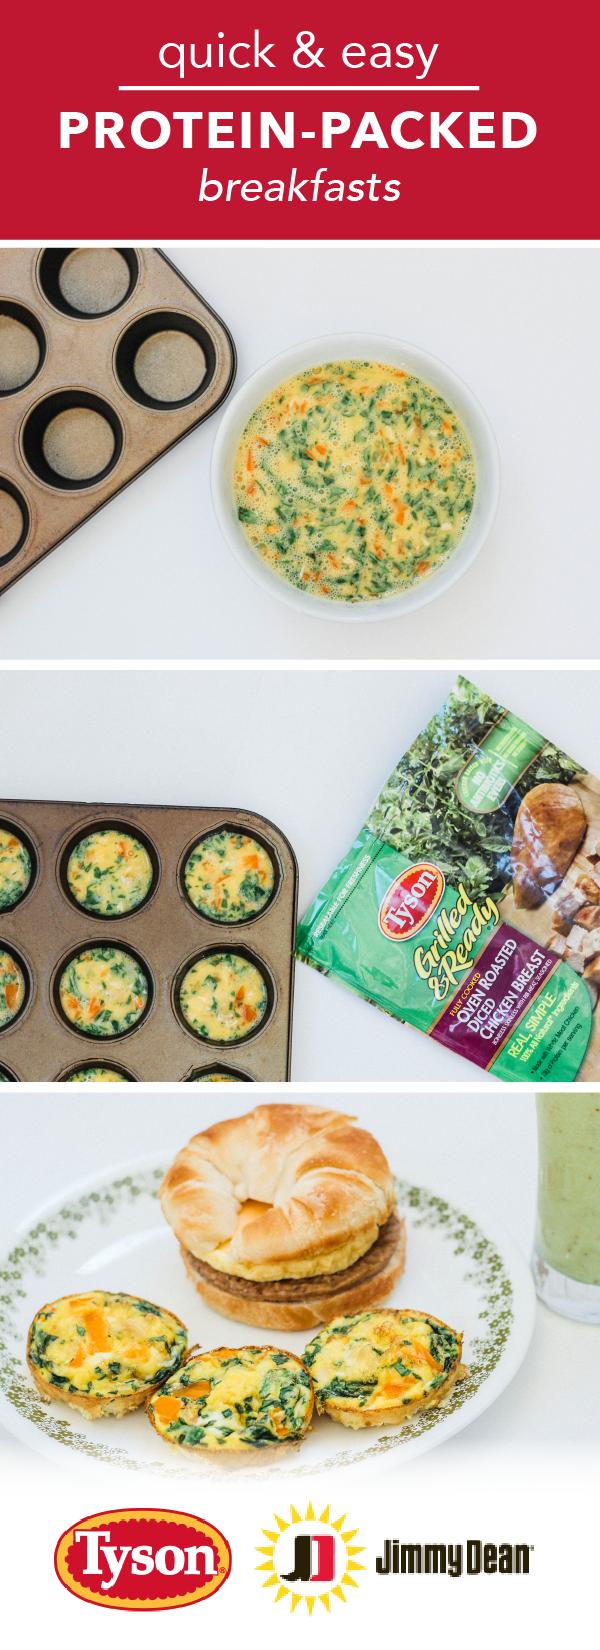 ProteinPacked Egg Bites Recipe Food